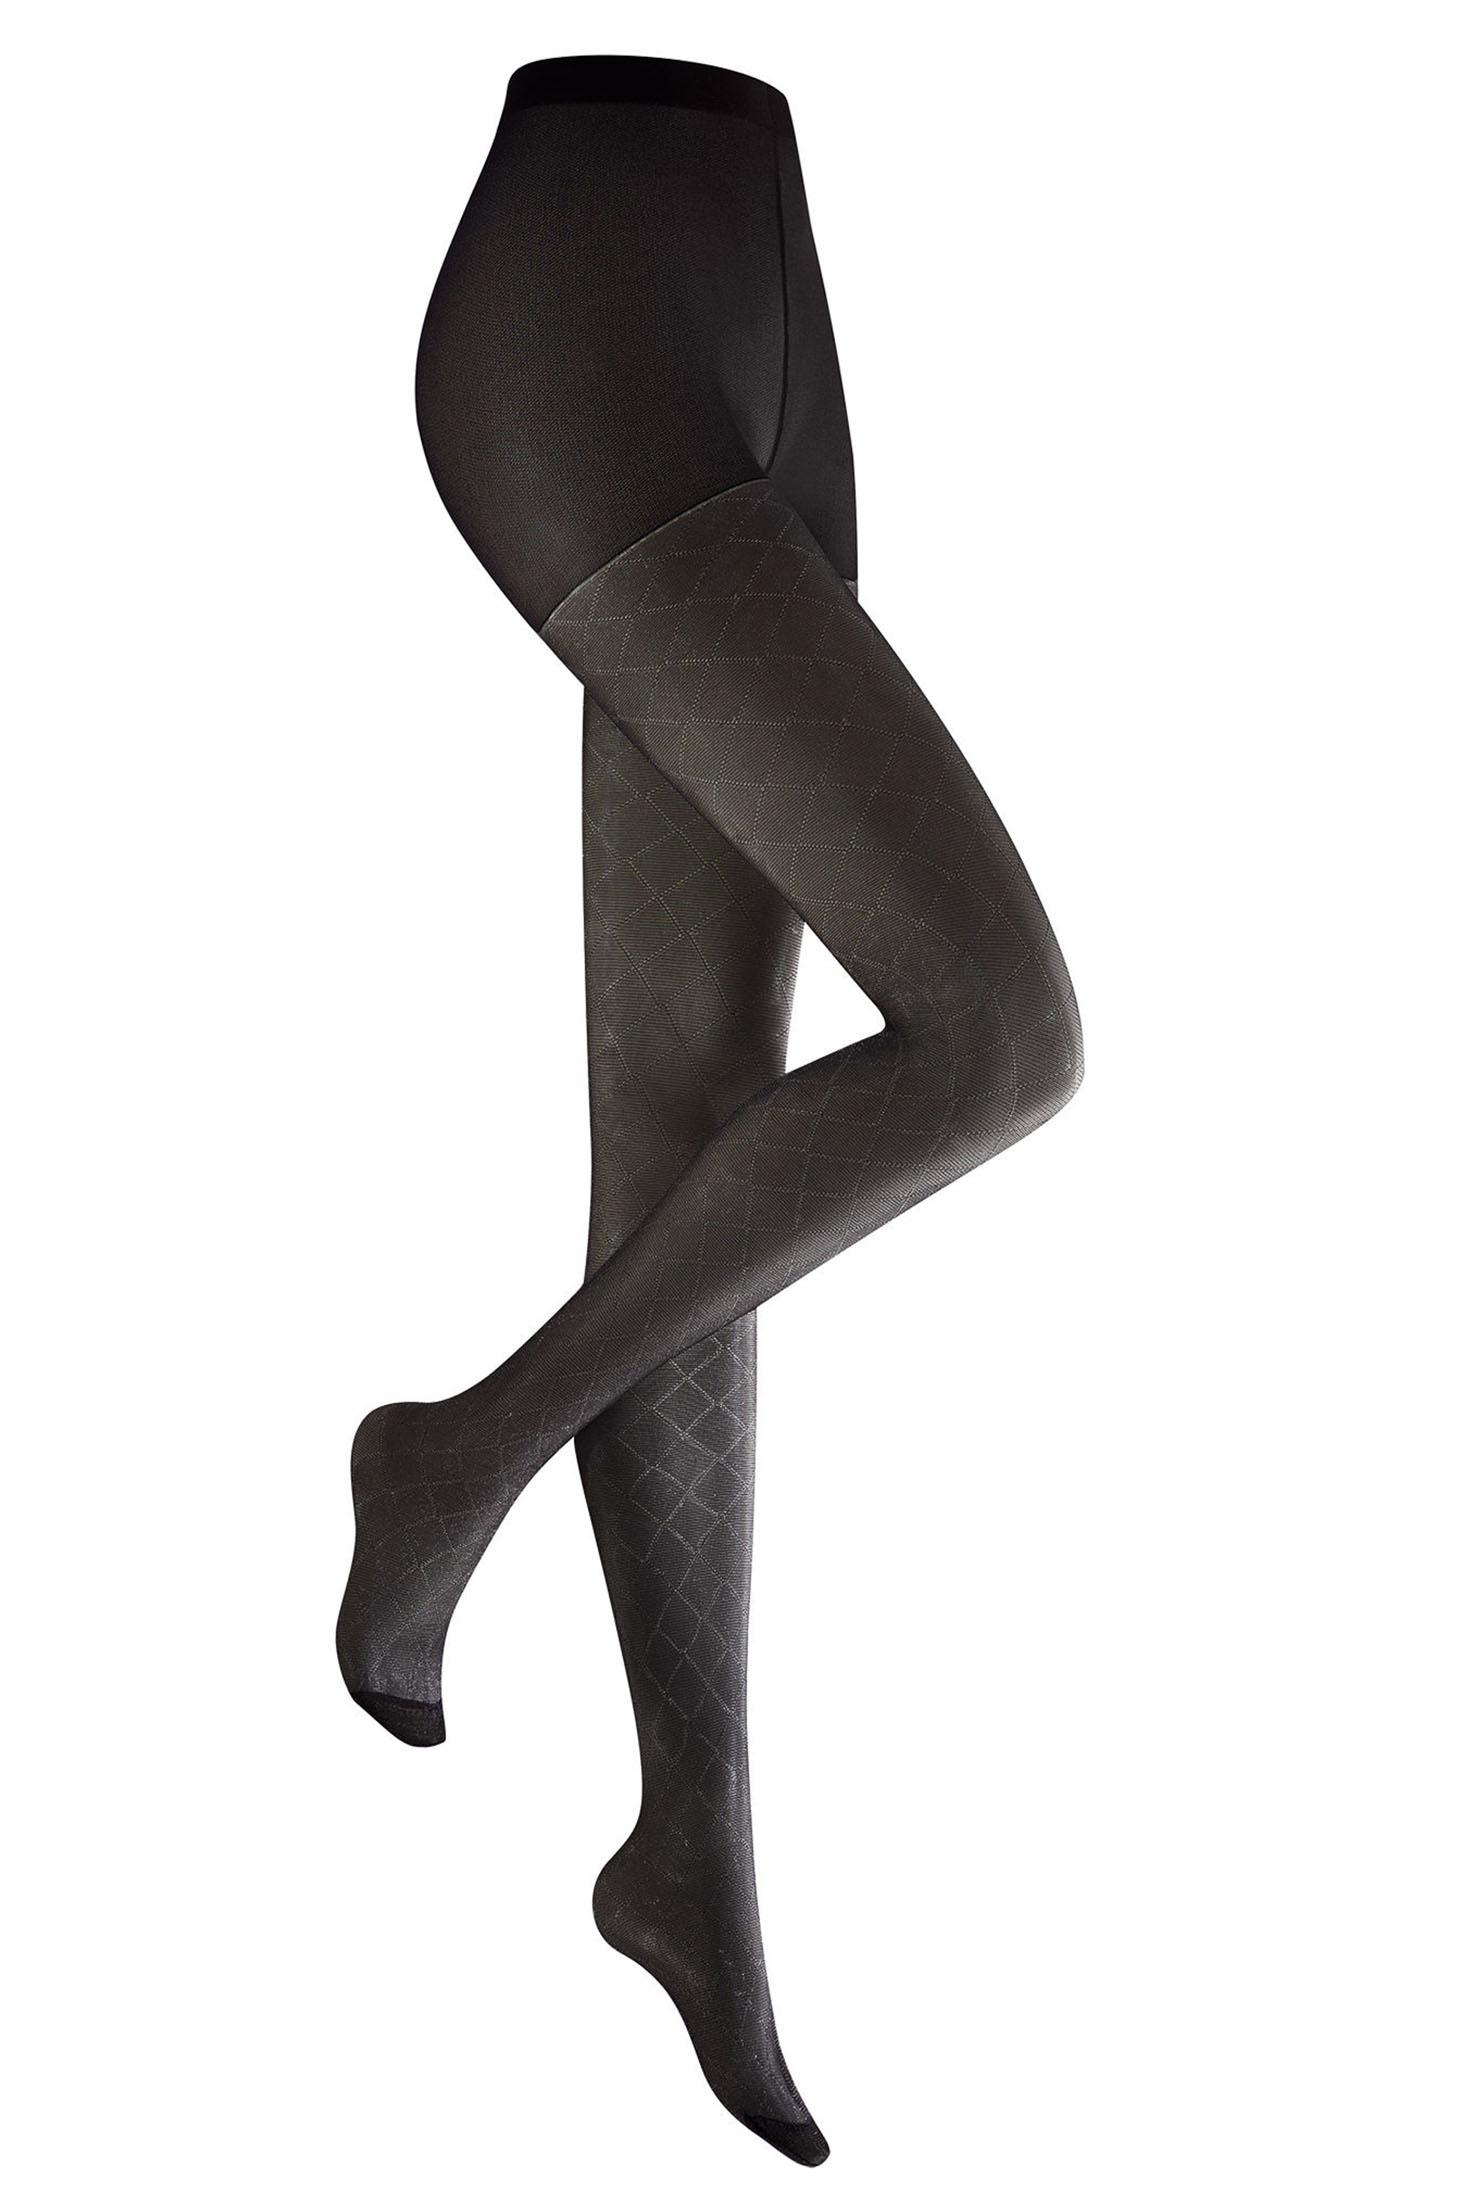 Dres Dama Kunert Sensational Black